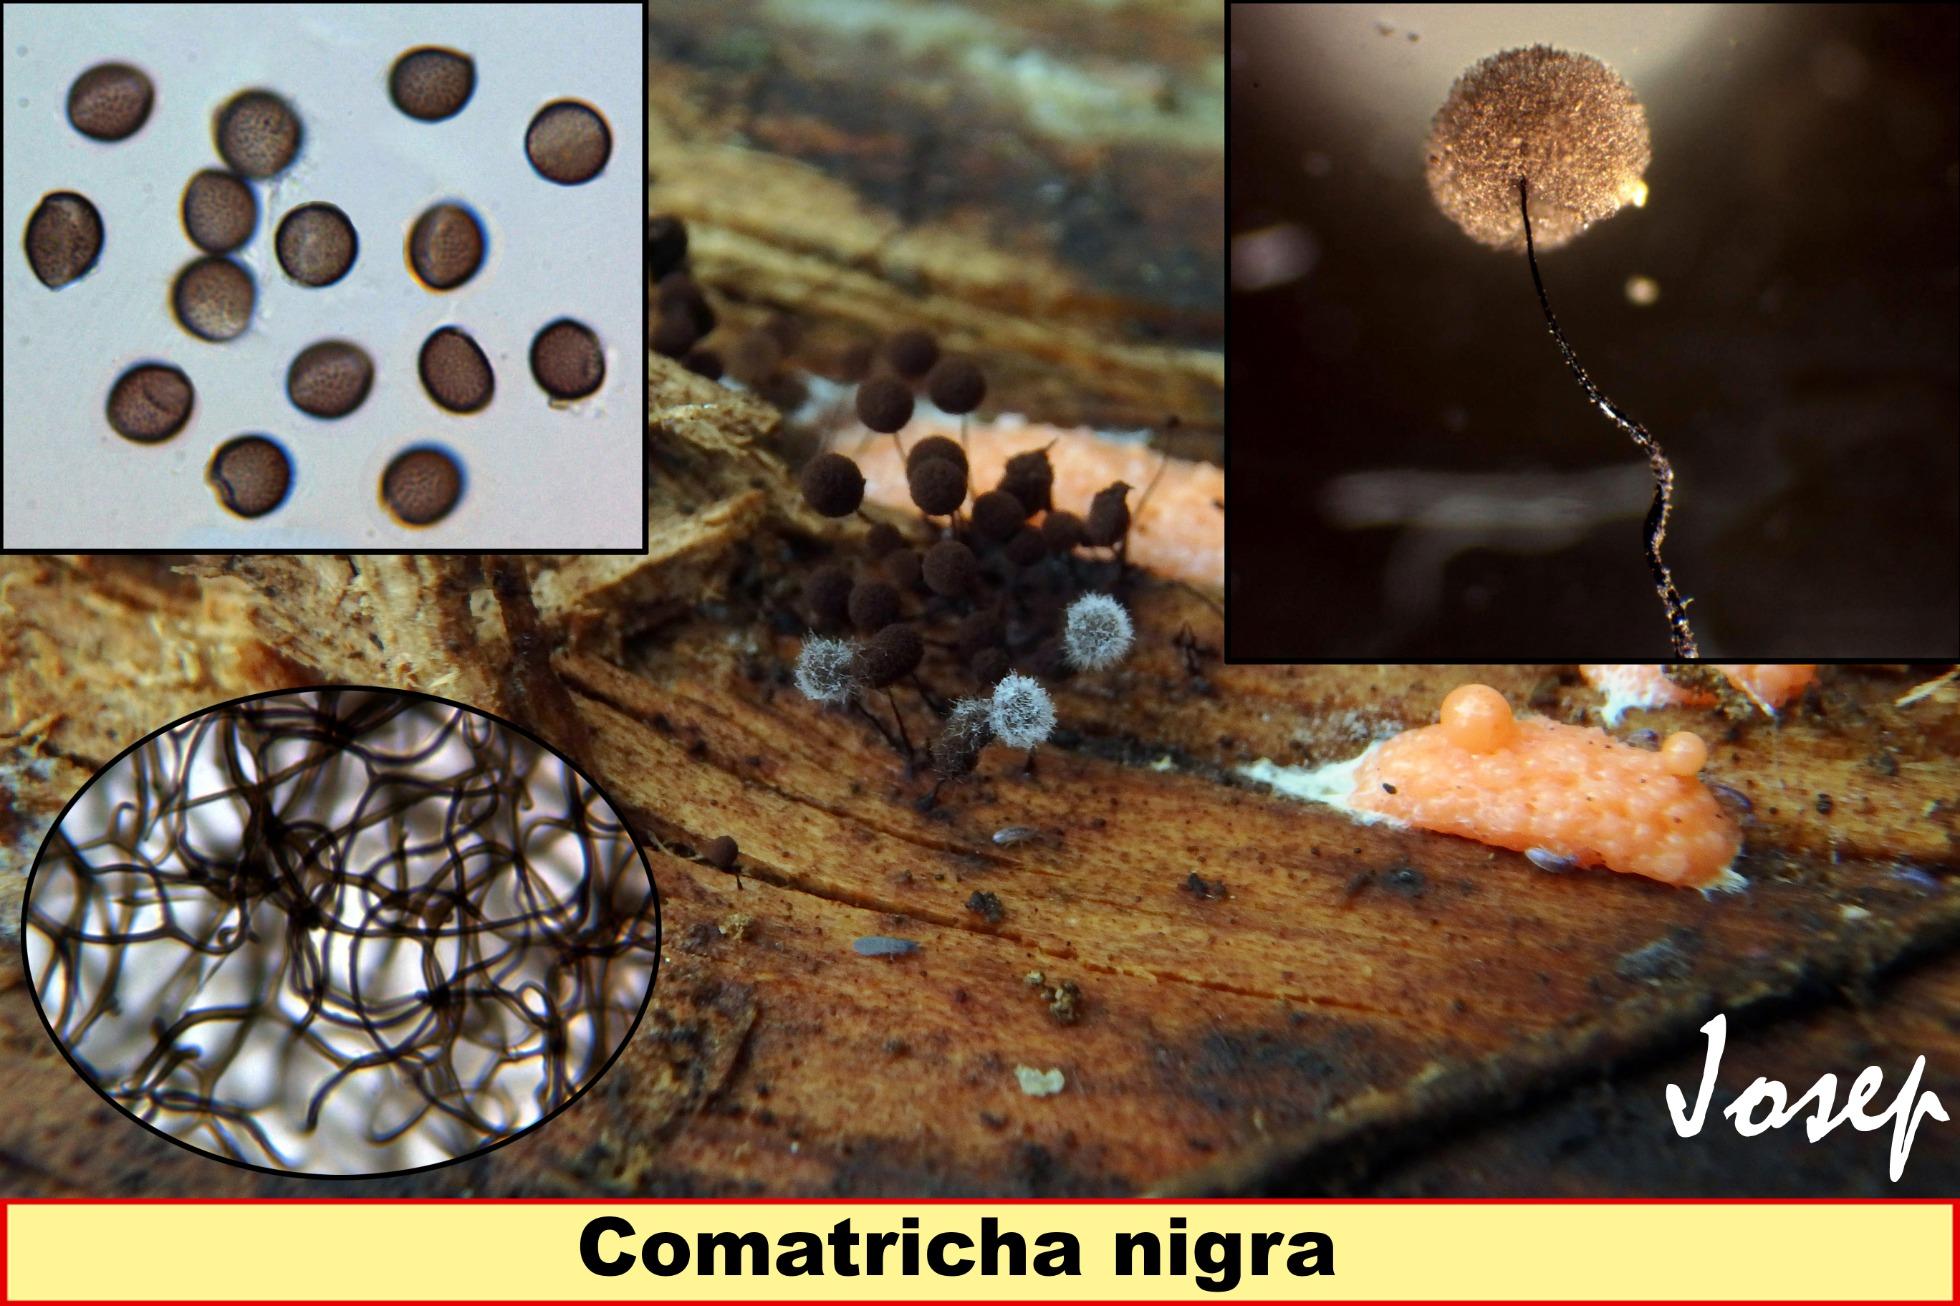 Comatrichanigra_2019-12-05.jpg